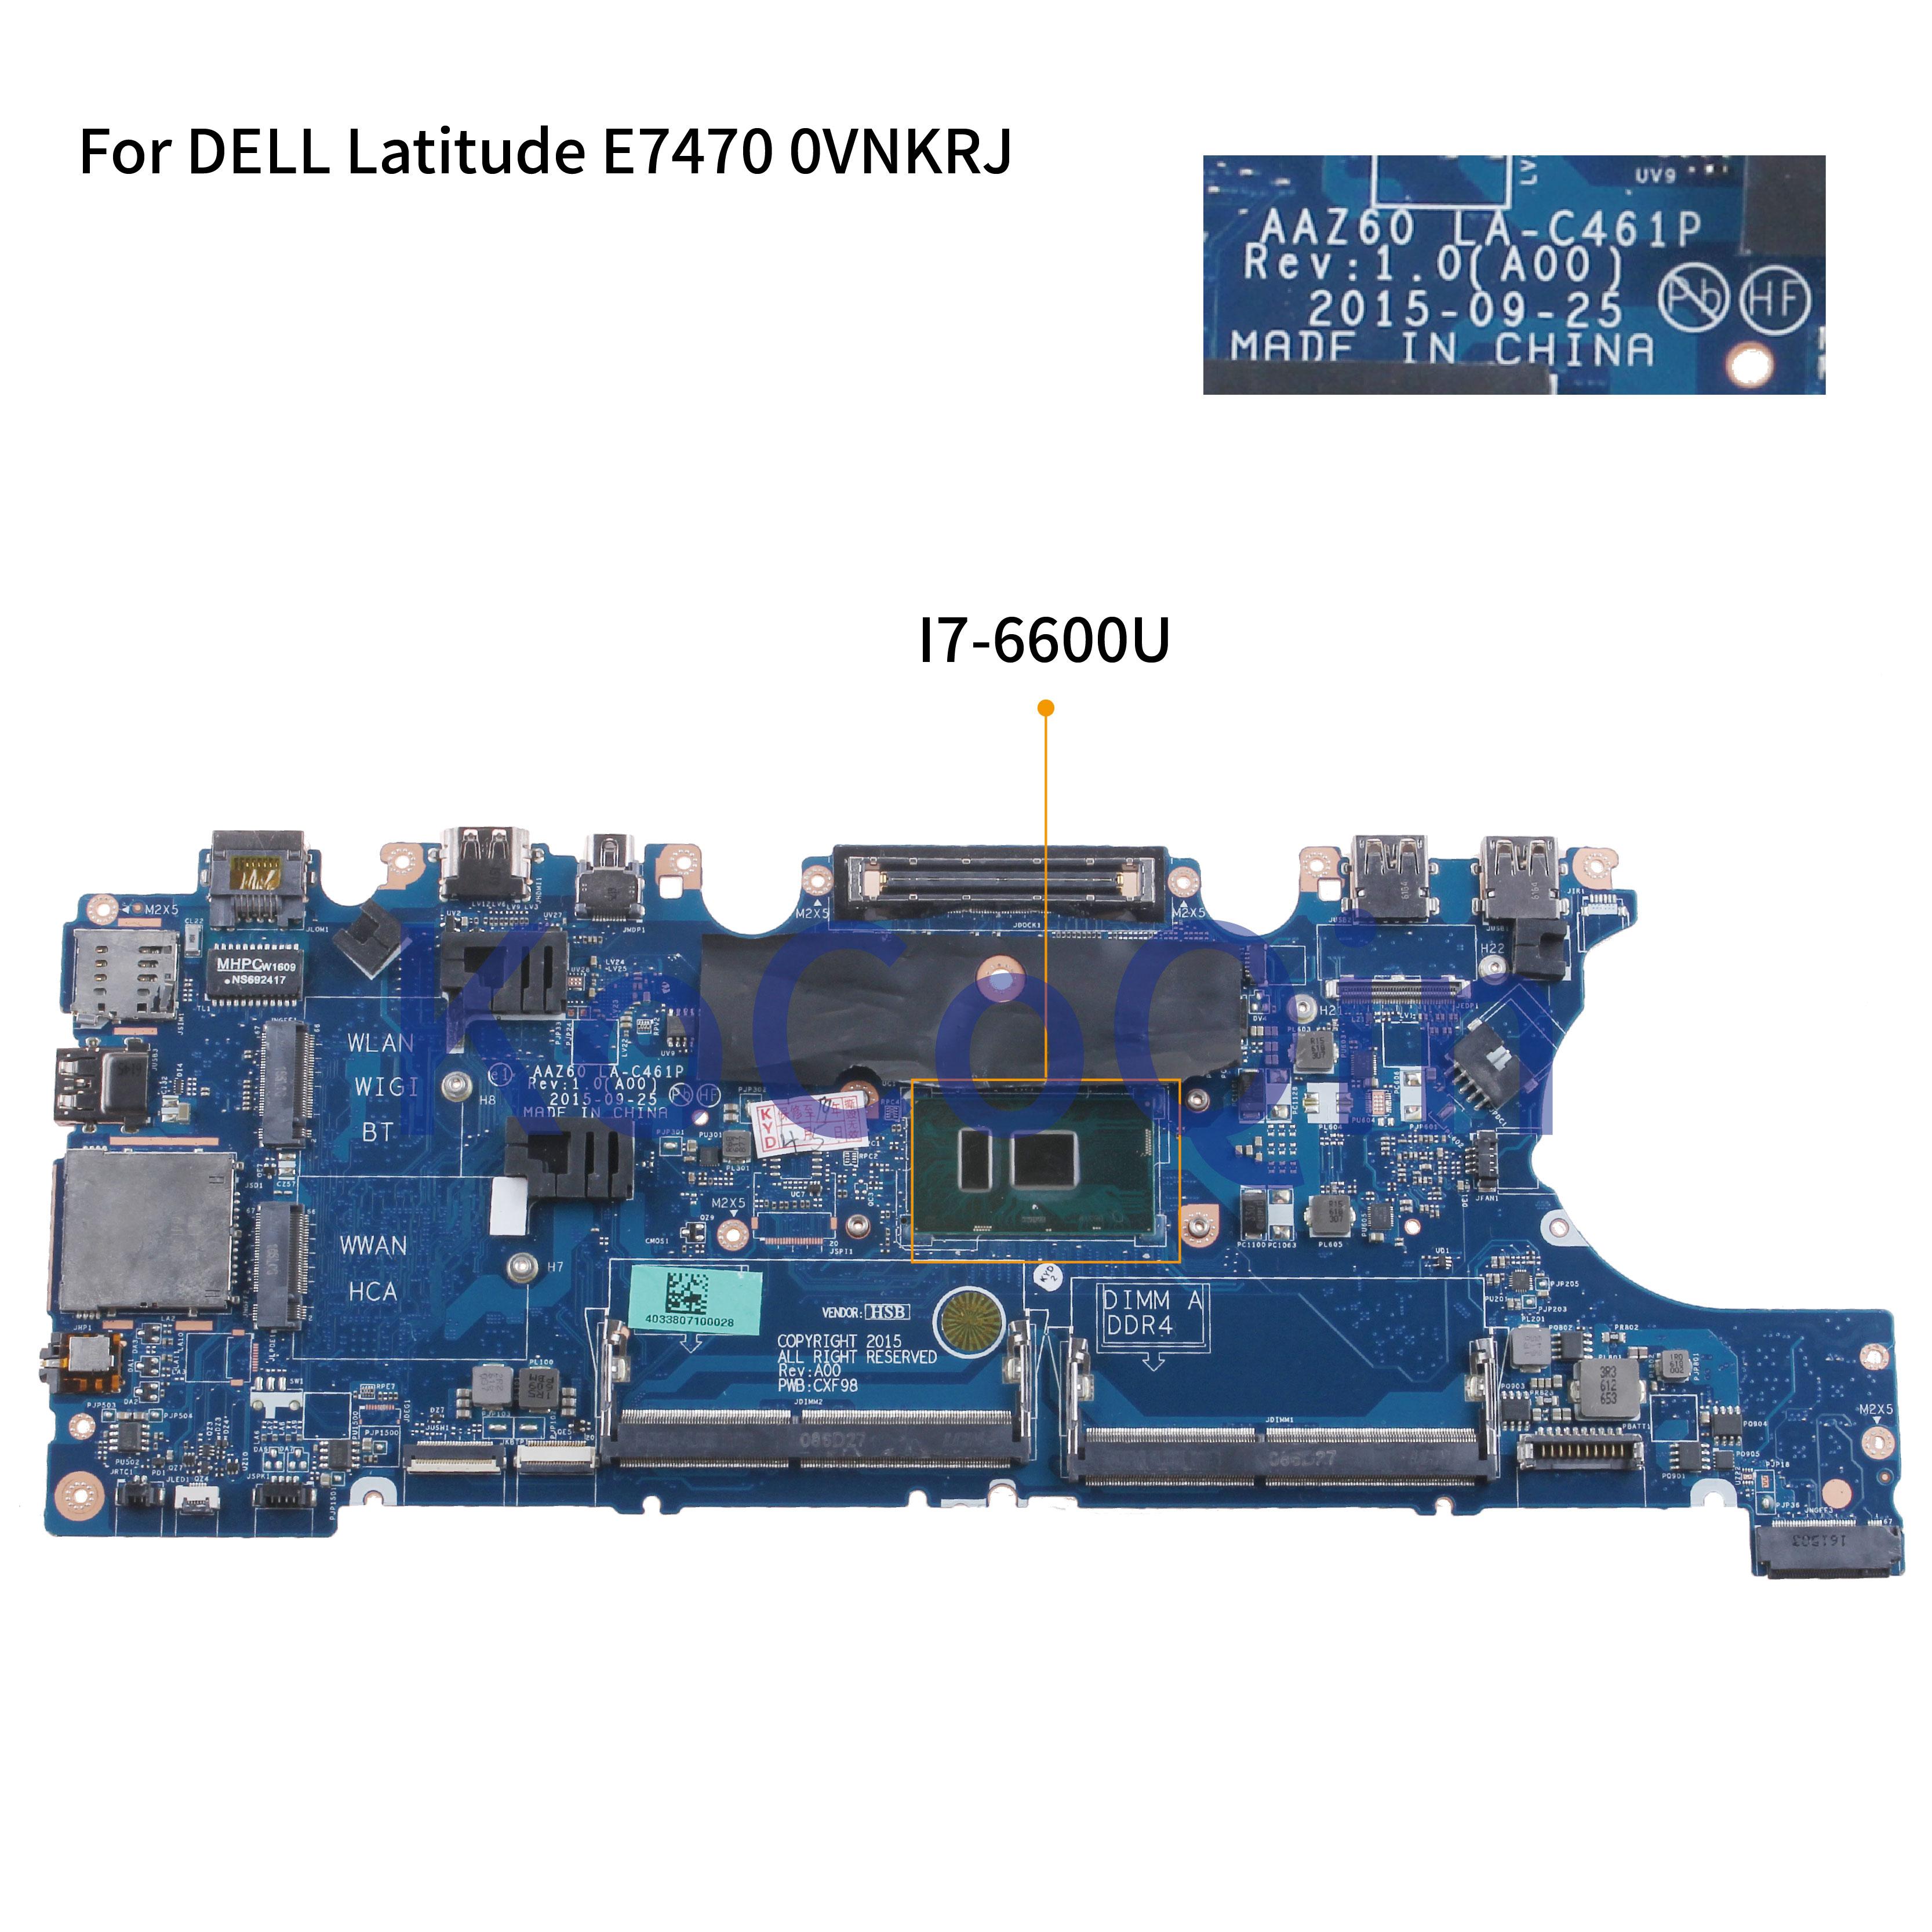 KoCoQin Laptop motherboard For DELL Latitude 7470 E7470 I7-6600U Mainboard CN-0VNKRJ 0VNKRJ AAZ60 LA-C461P SR2F1 CPU